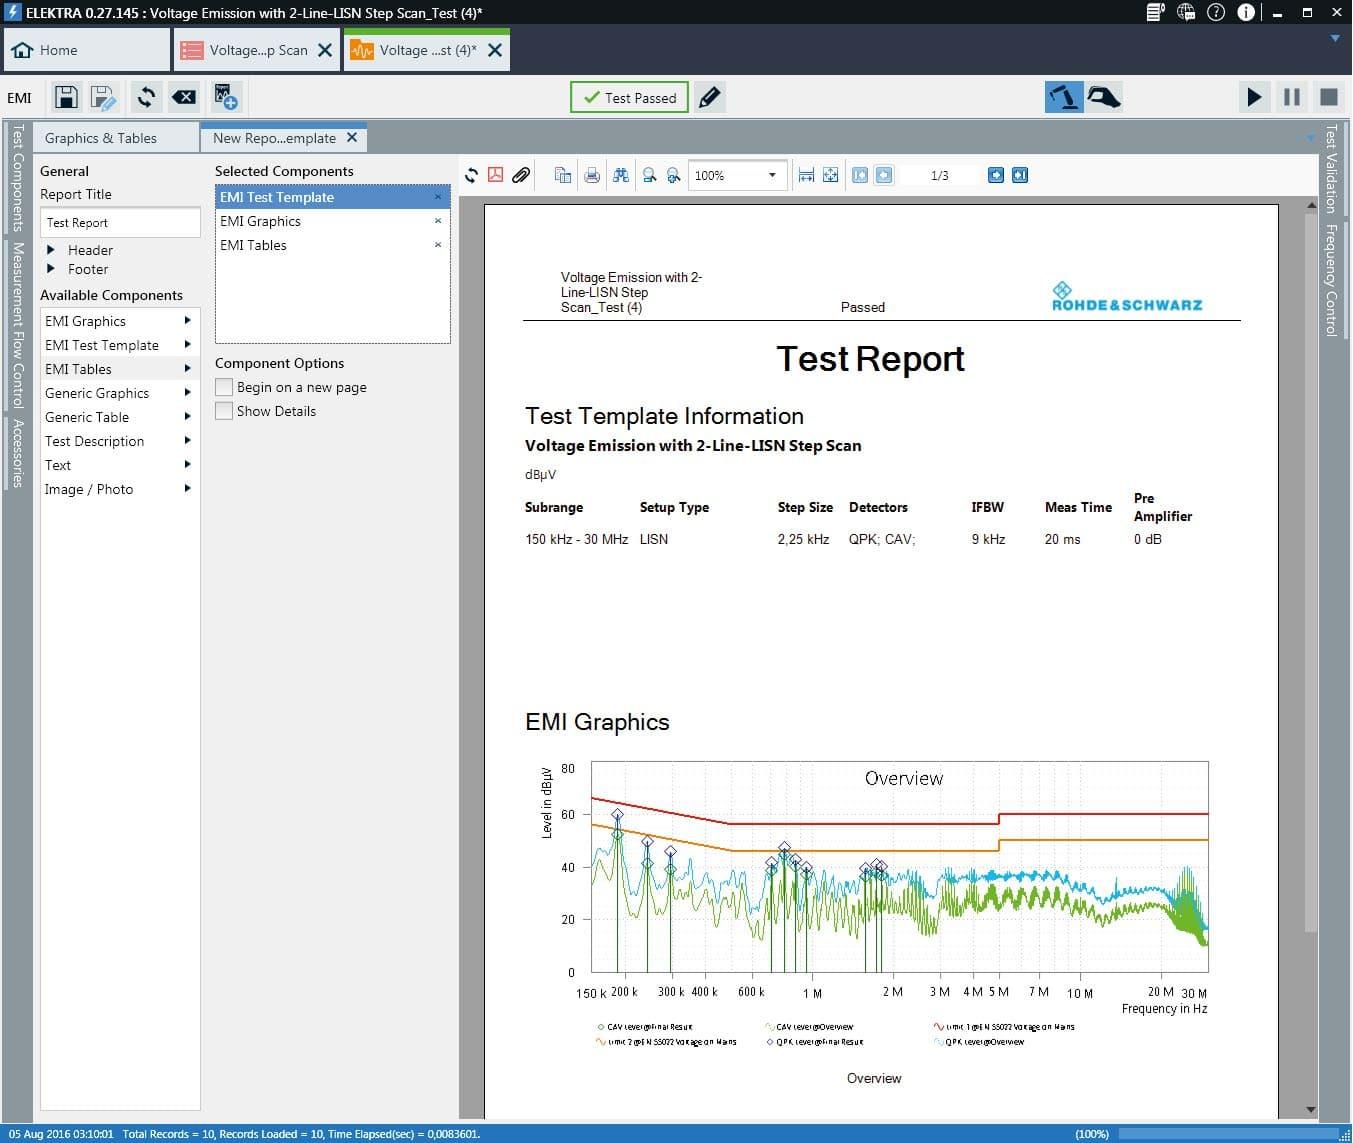 Rohde & Schwarz ELEKTRA EMI Testsoftware Testreport